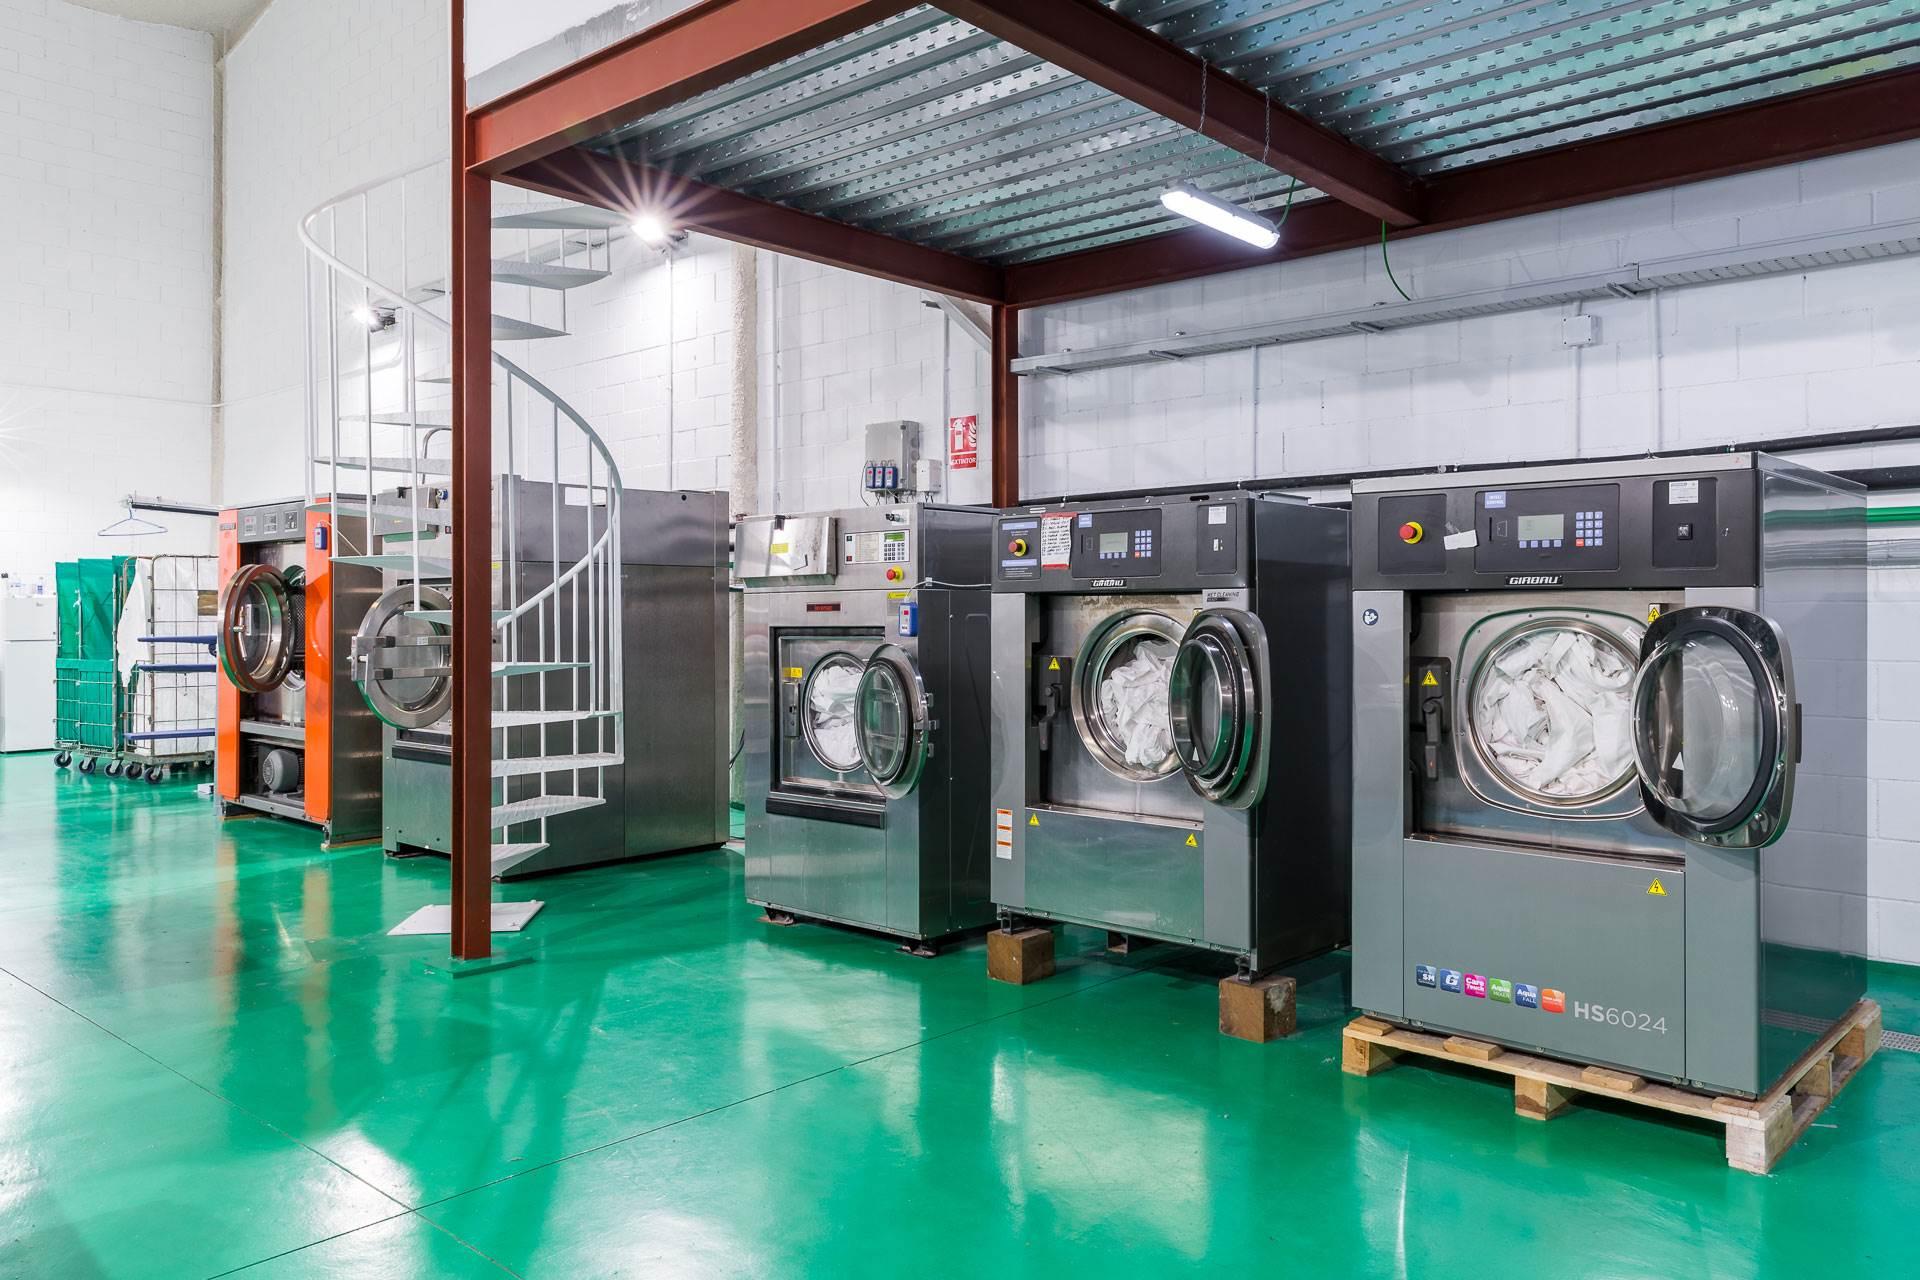 lavanderia industrial empresas